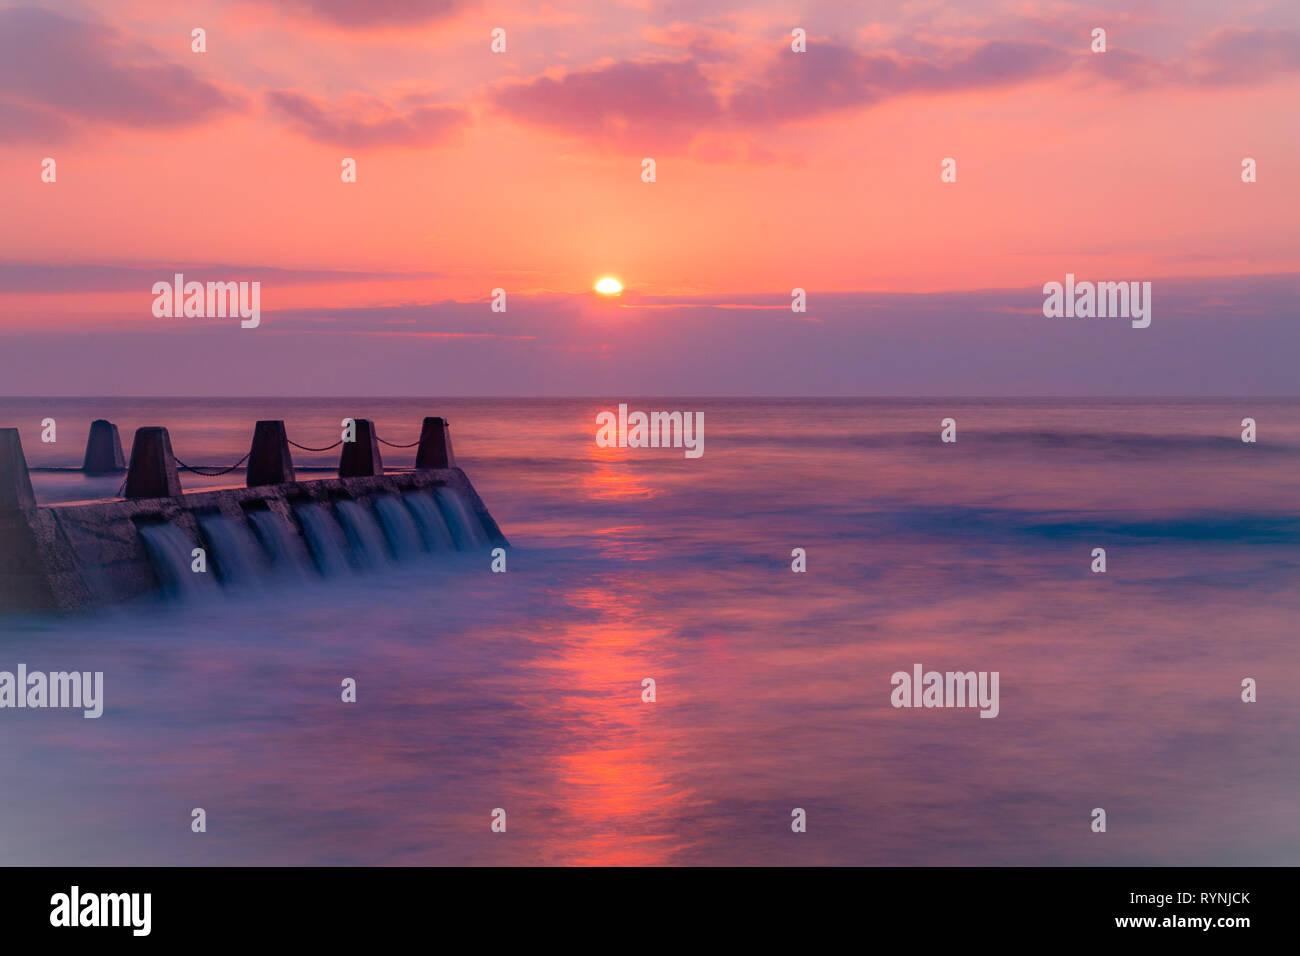 On The Horizon - Stock Image